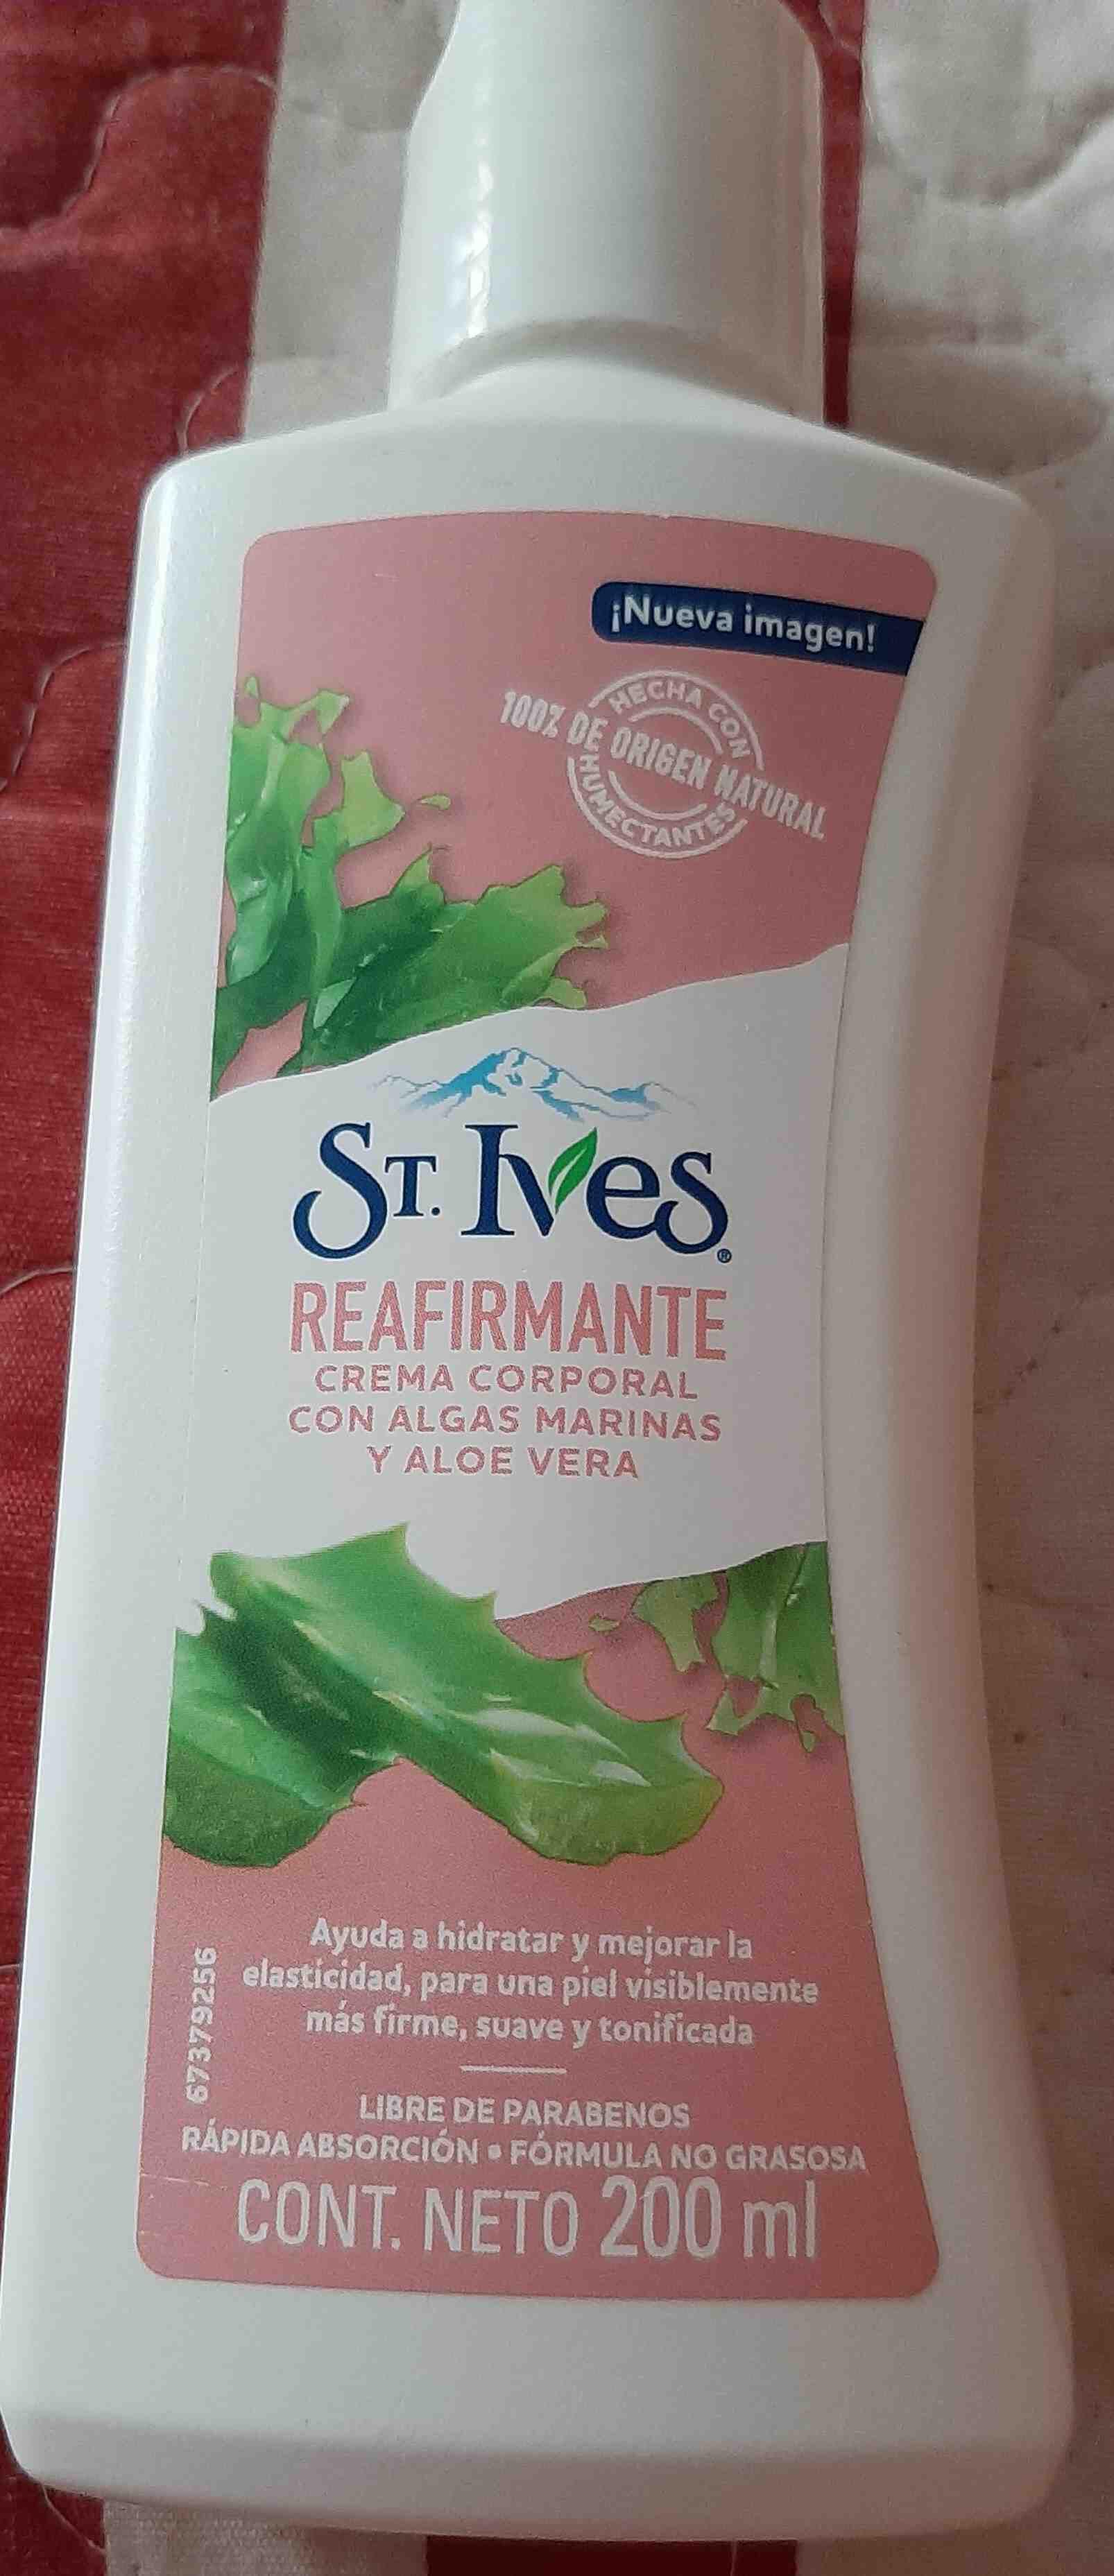 ST. Ives reafirmante - Product - en